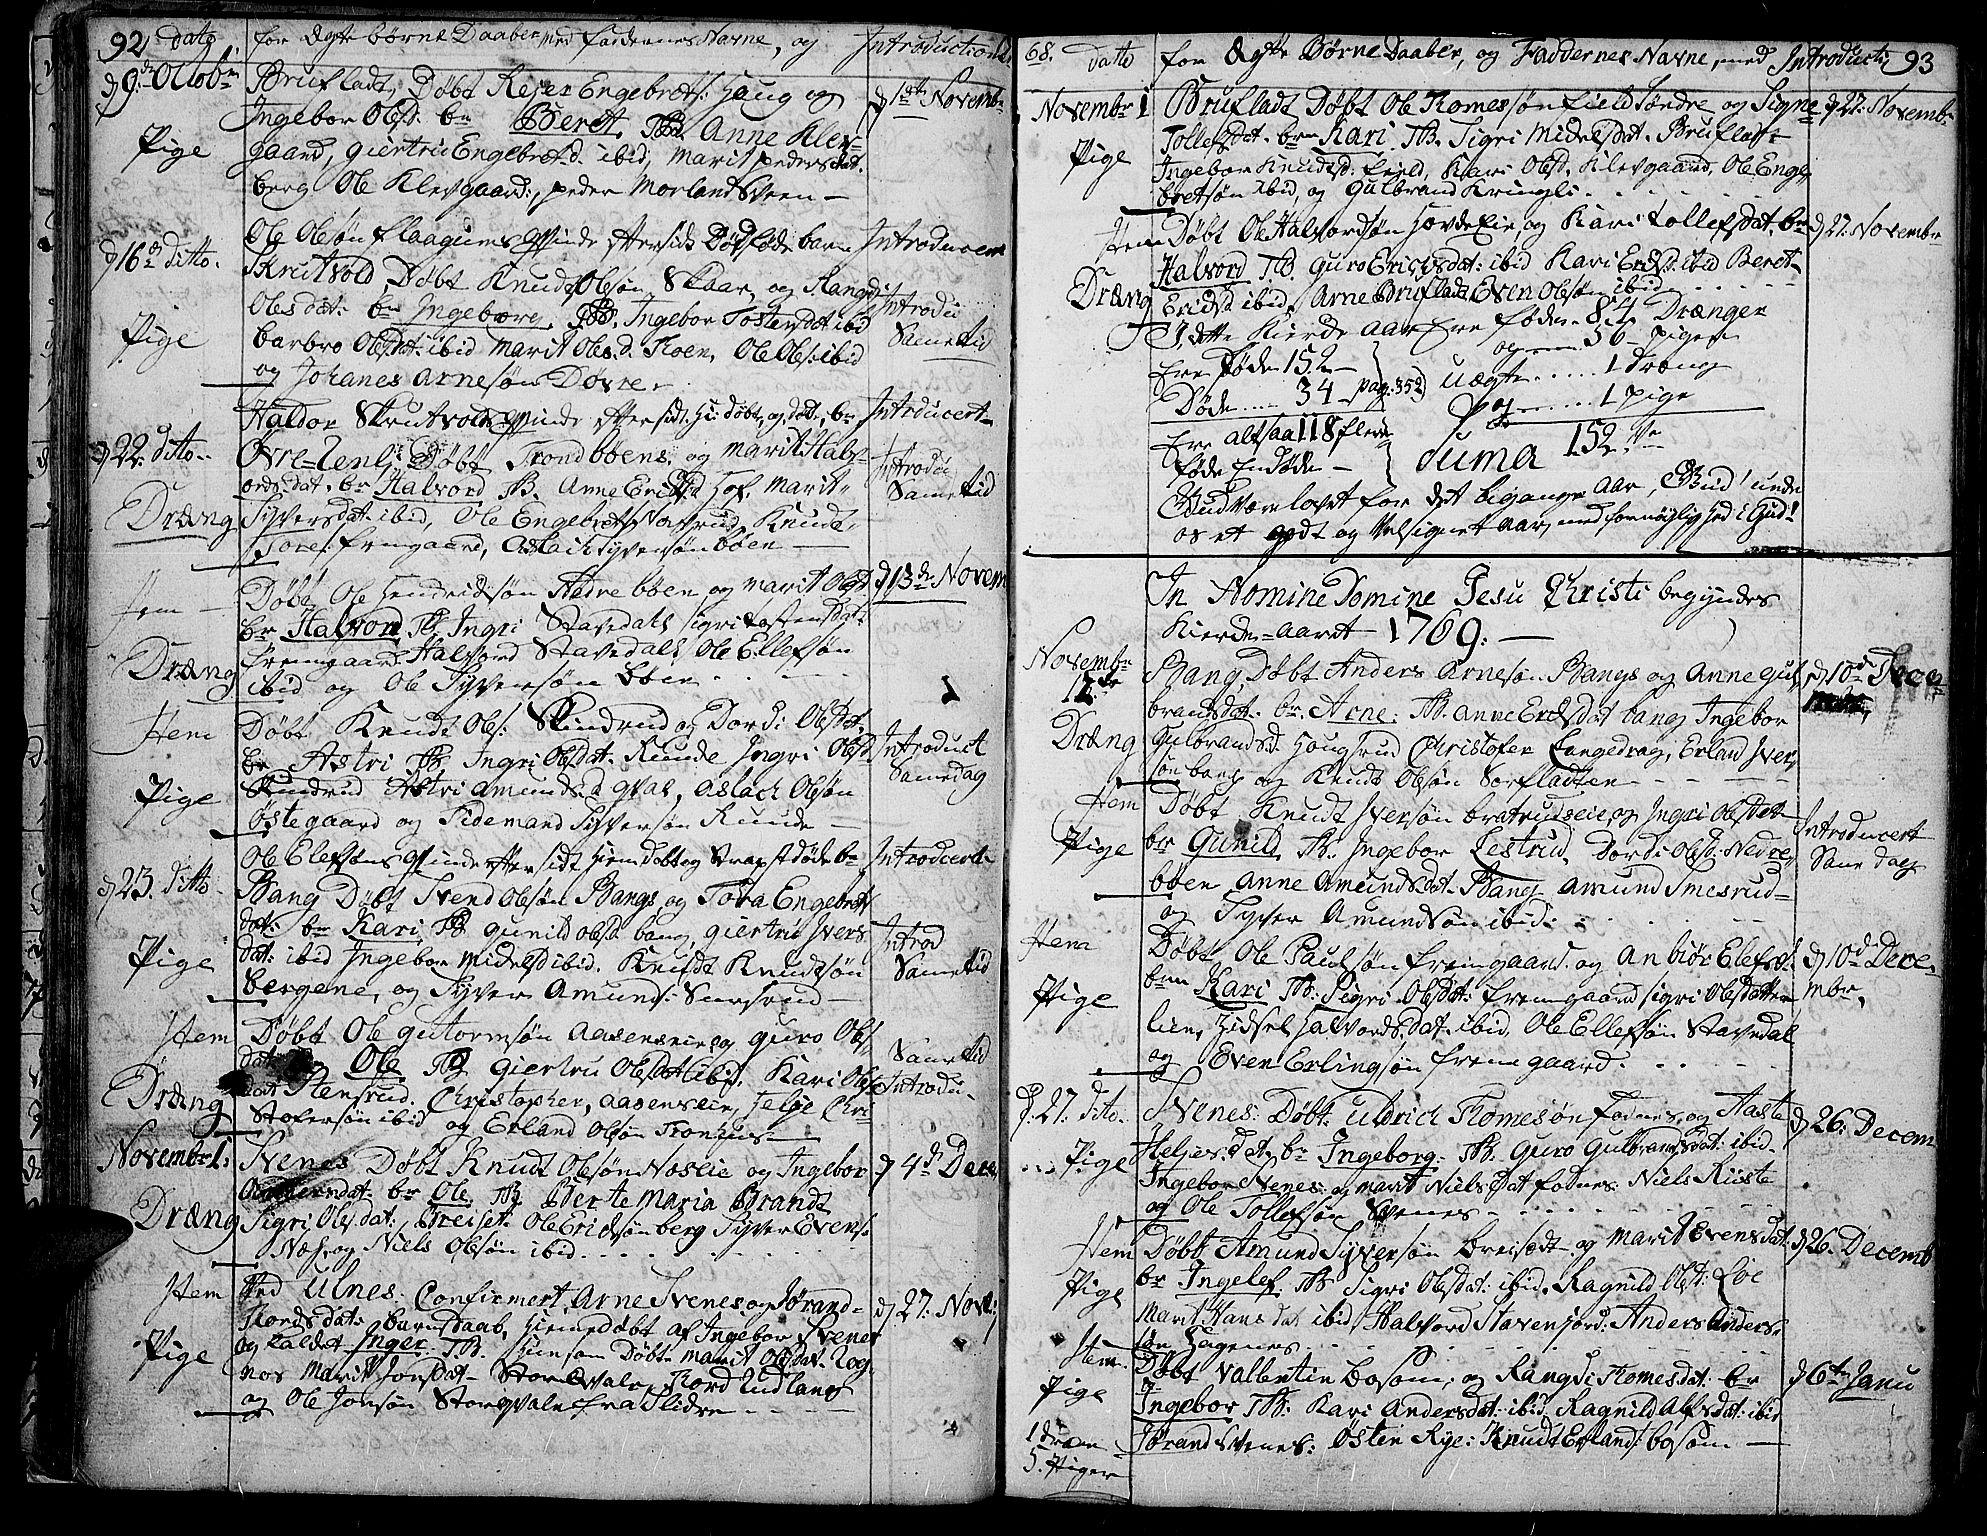 SAH, Aurdal prestekontor, Ministerialbok nr. 5, 1763-1781, s. 92-93